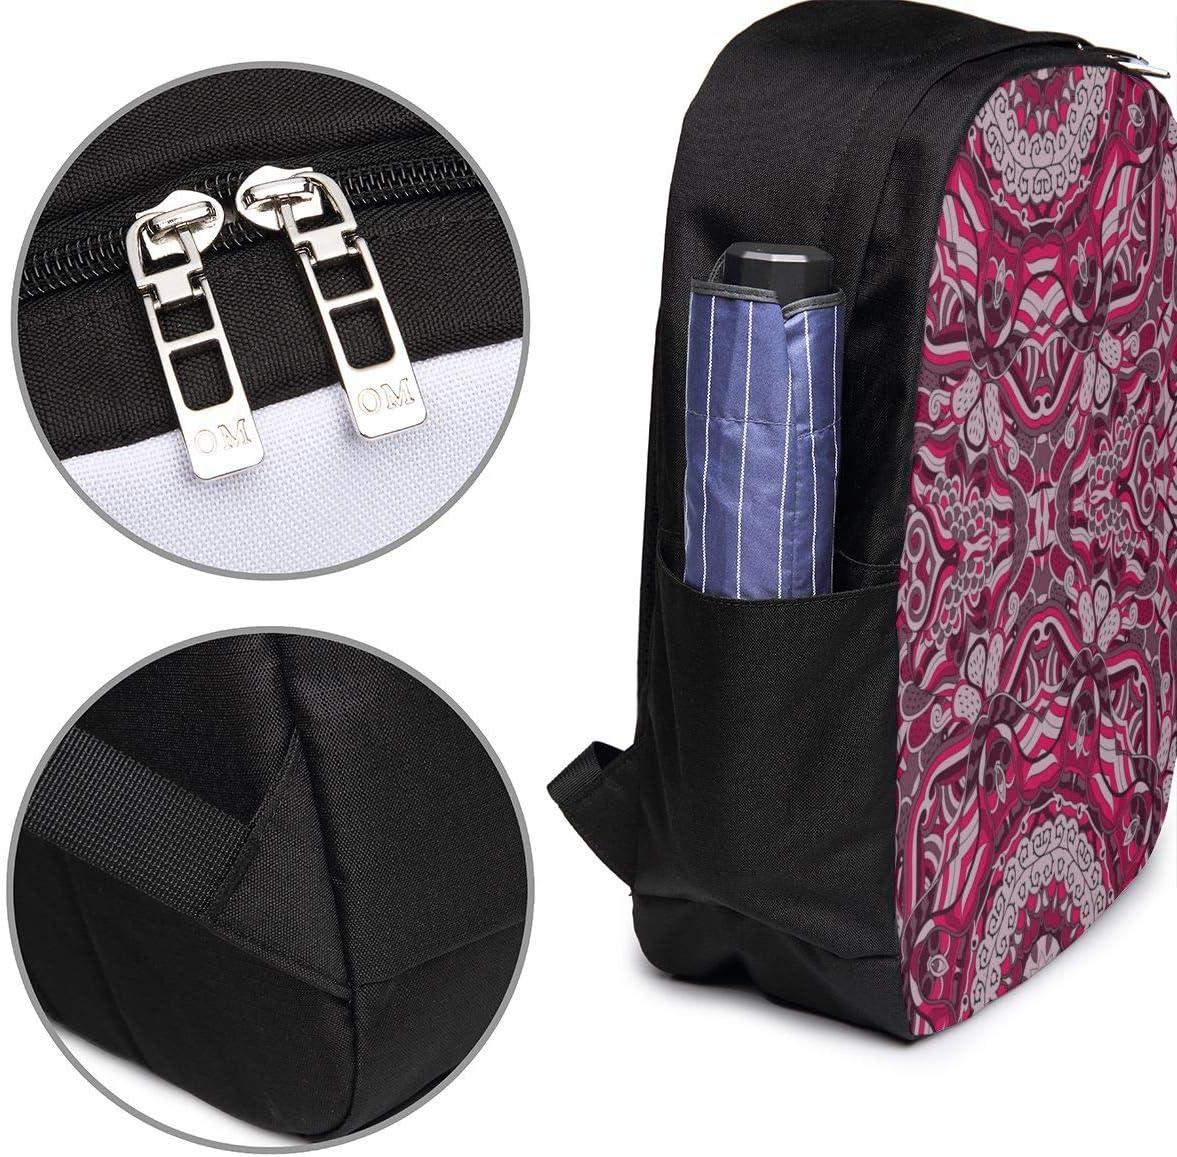 Ethnic Colorful Doodle Texture Laptop Backpack 17 Inch Business Travel Backpacks for Men Women Adjustable Shoulder Strap with USB Charging Port Black Mens and Womens Travel Daypack